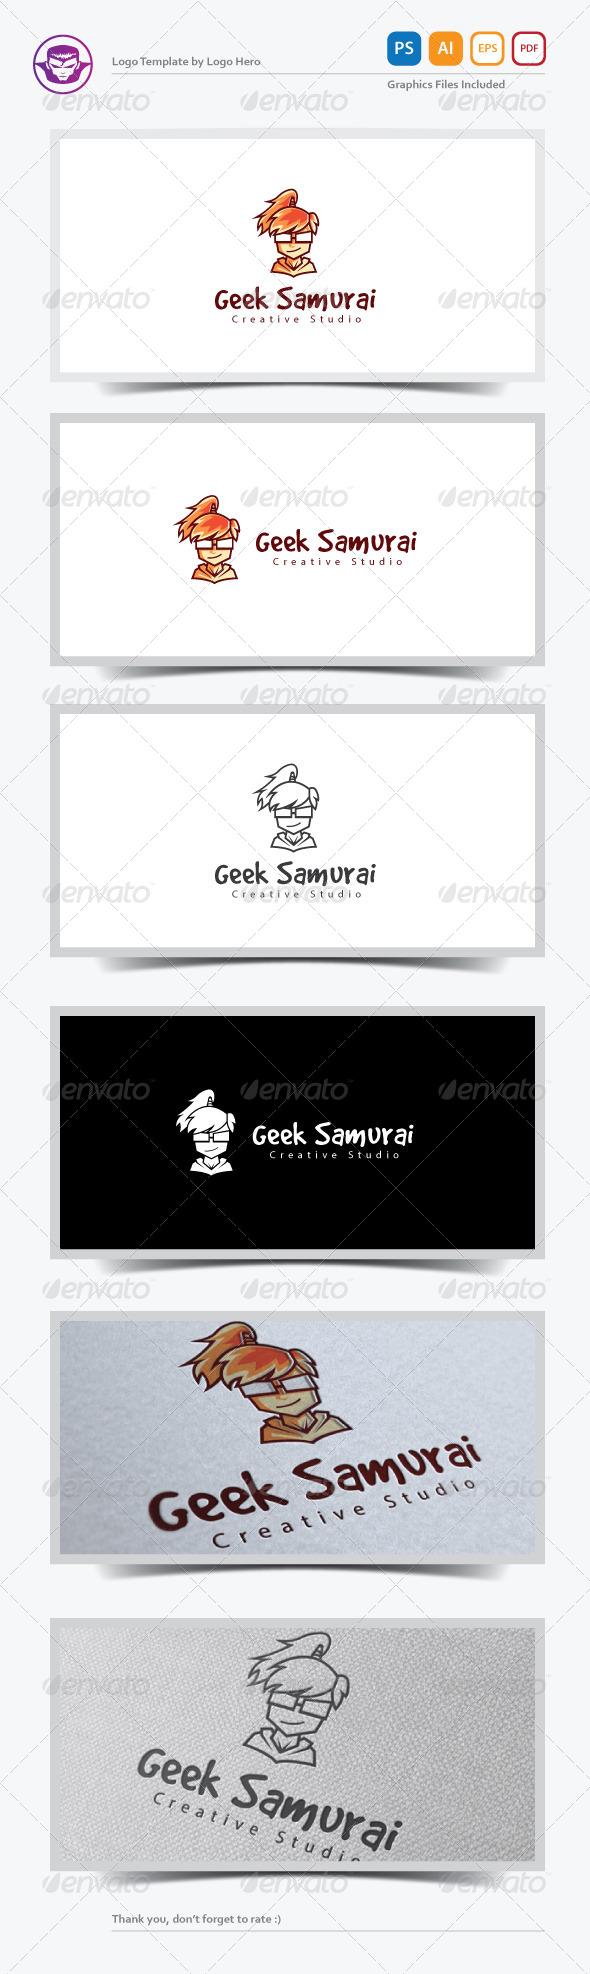 Geek Samurai Logo Template